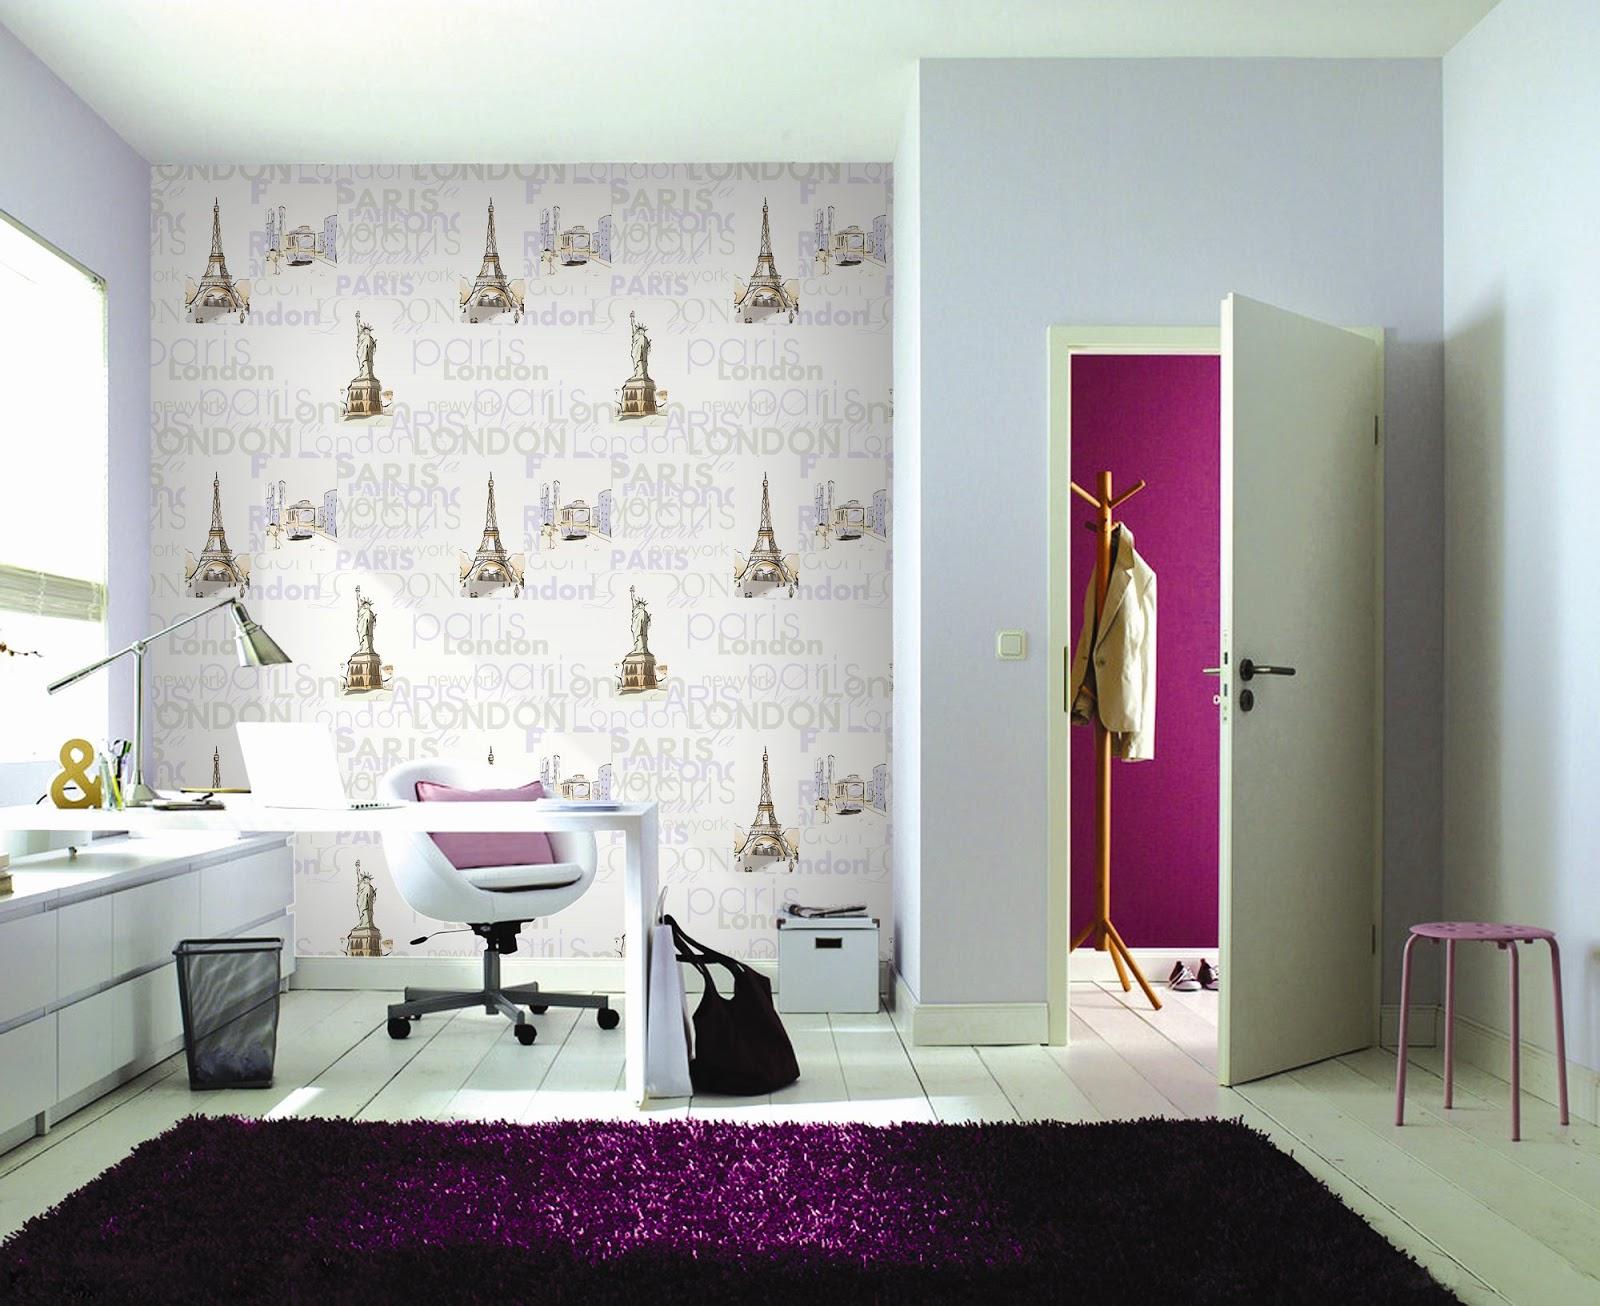 0821 3267 3033Toko Wallpaper Dinding Malang Wallpaper Dinding